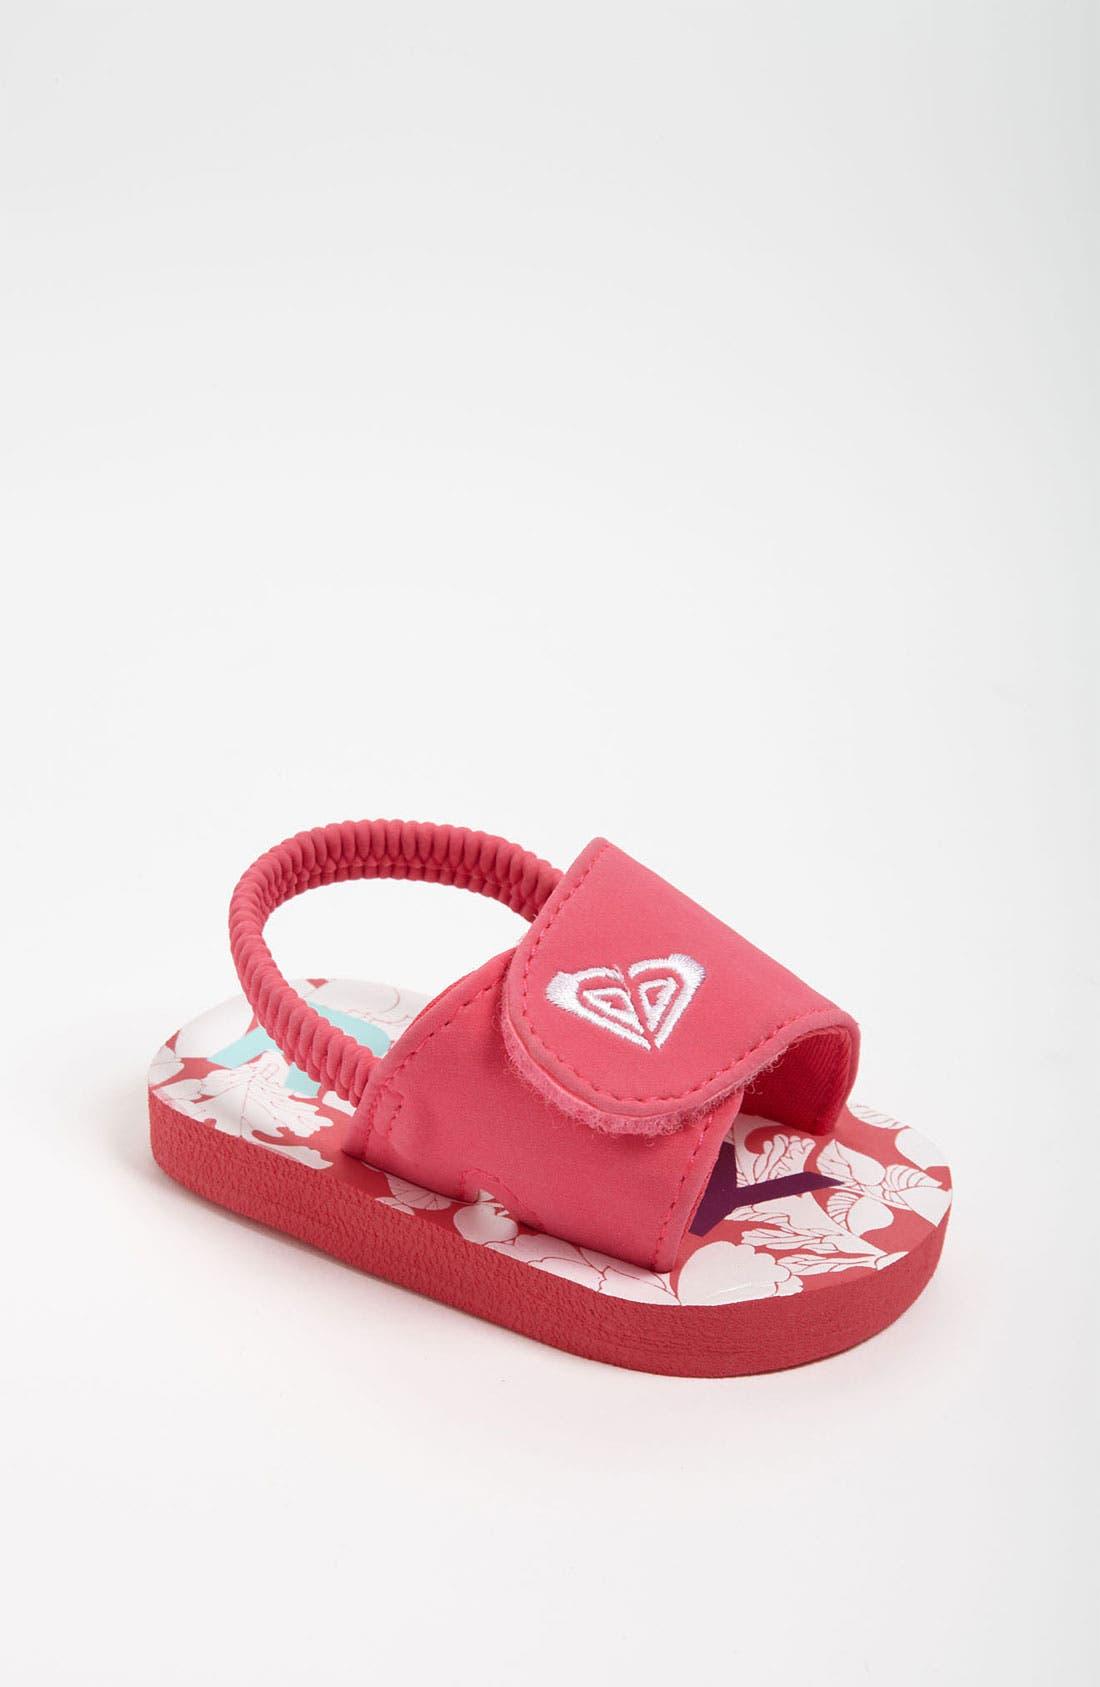 Main Image - 'Tip Toe II' Sandal (Baby)